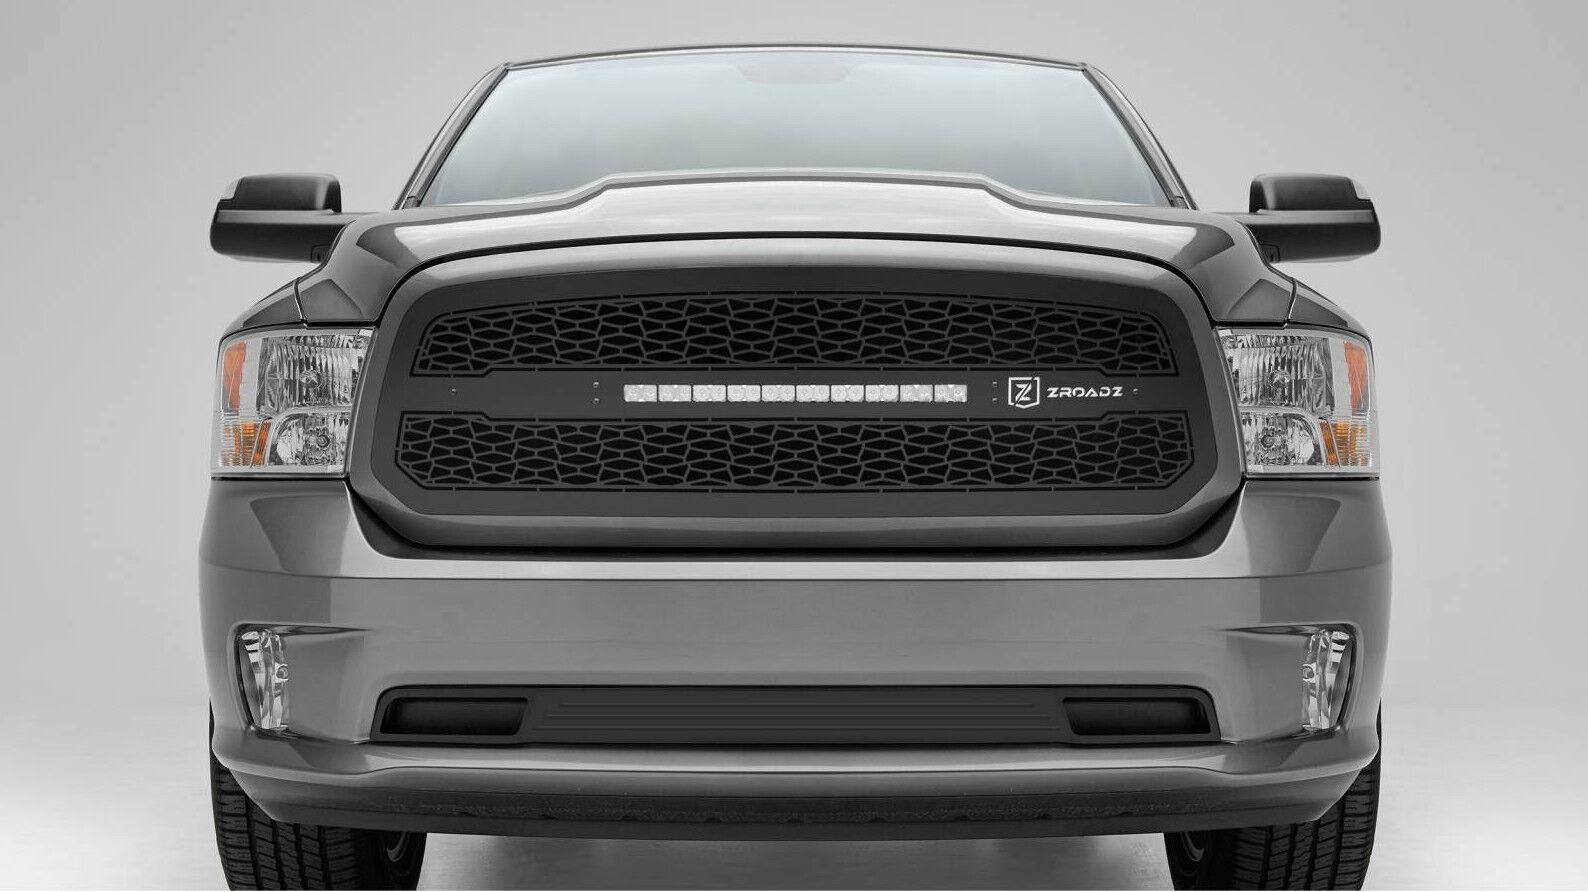 2013 2016 dodge ram 1500 zroadz series black grille grill w led light bar t rex ebay. Black Bedroom Furniture Sets. Home Design Ideas